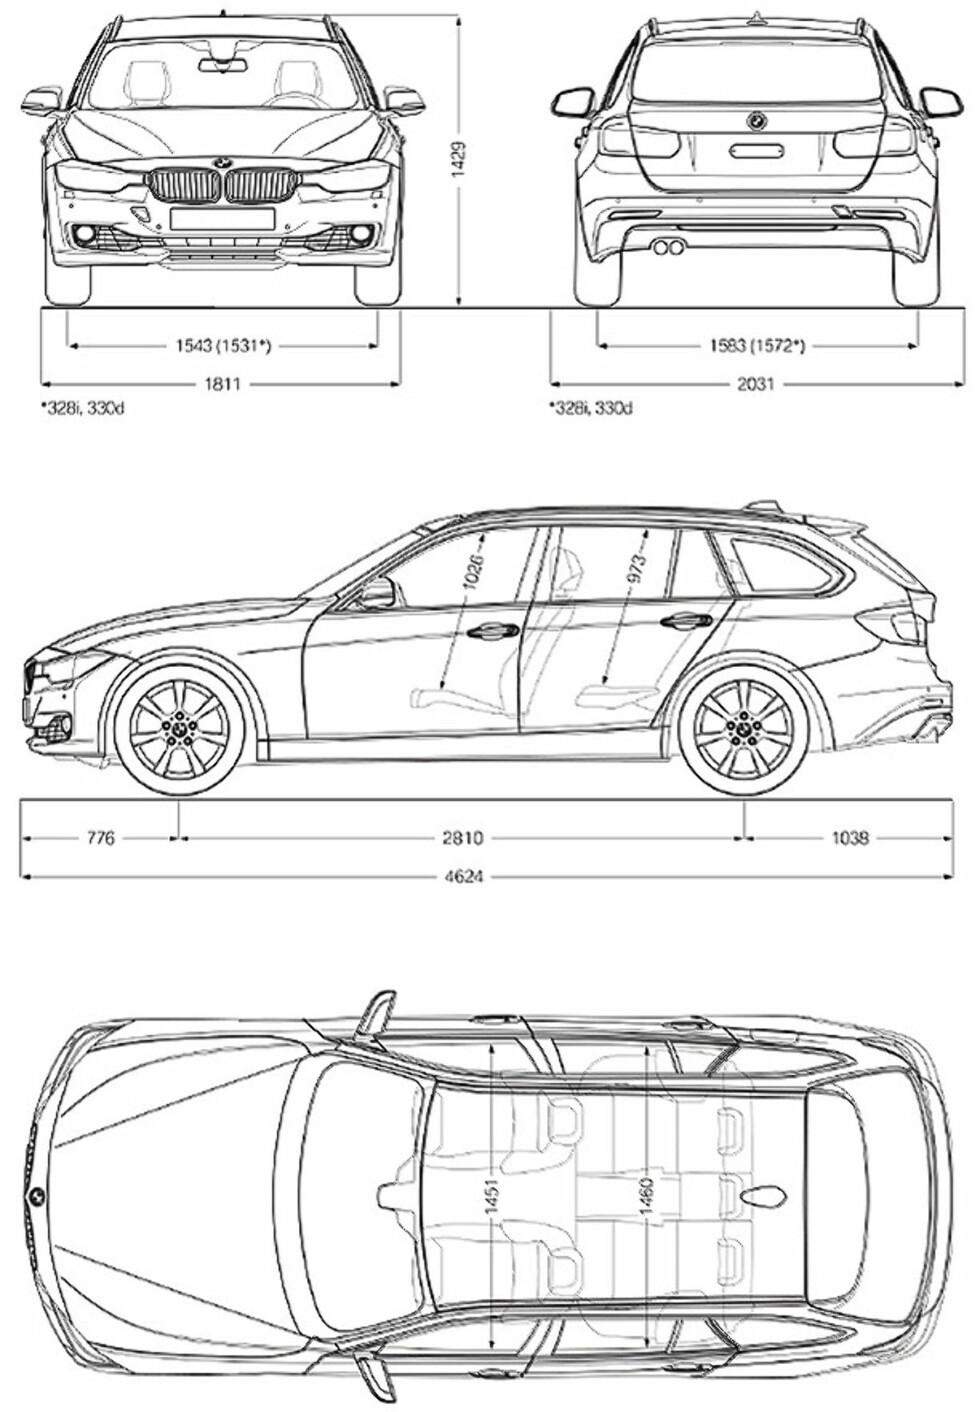 BMW 3-serie Touring prøvekjørt